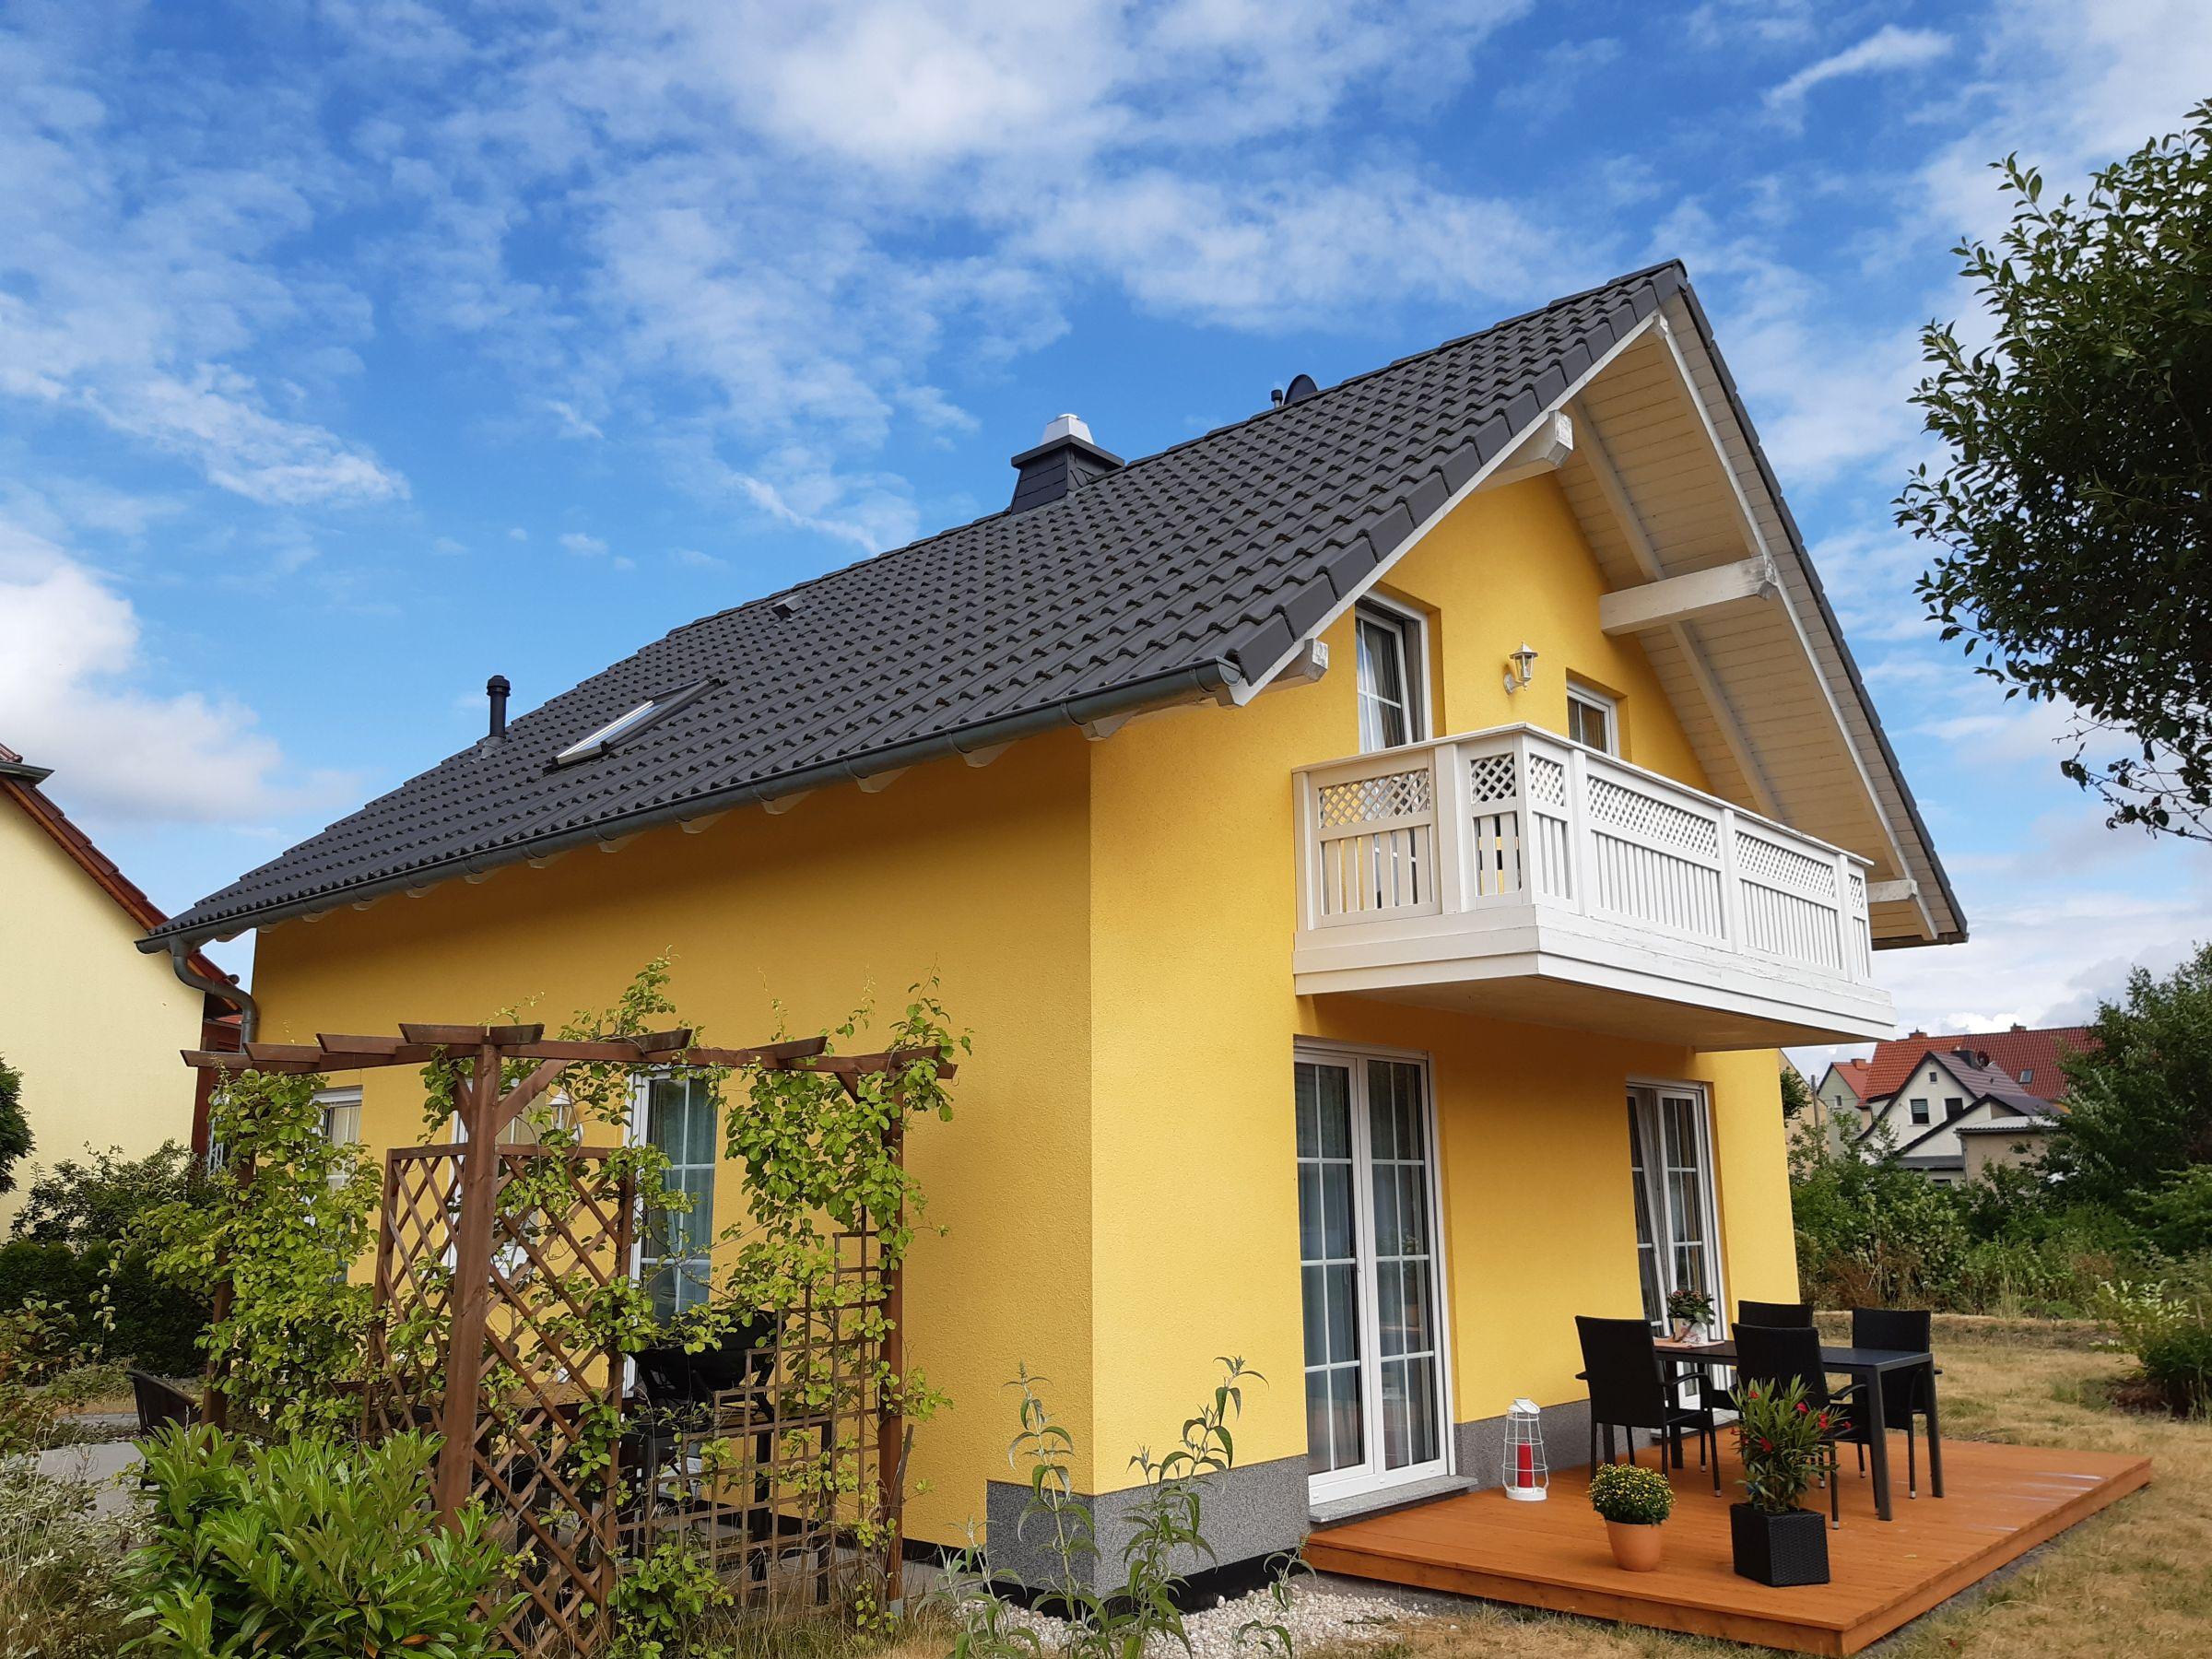 Gästezimmer Rosi (Bad Klosterlausnitz). Doppe Ferienhaus in Thüringen